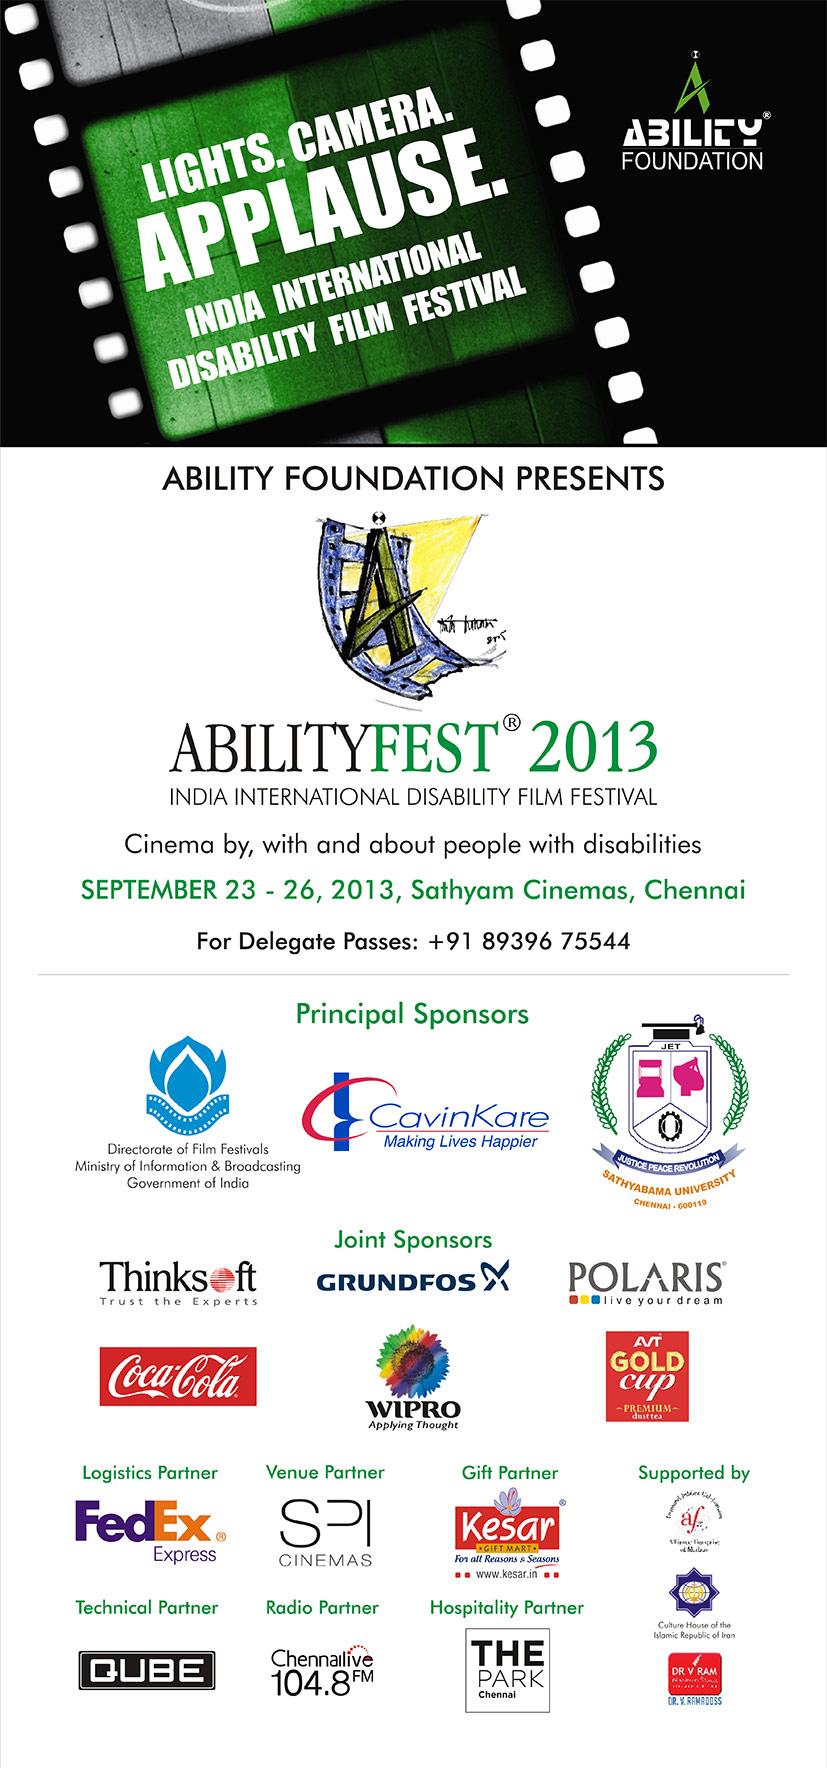 Ability_Fest_2013_poster_sep2013